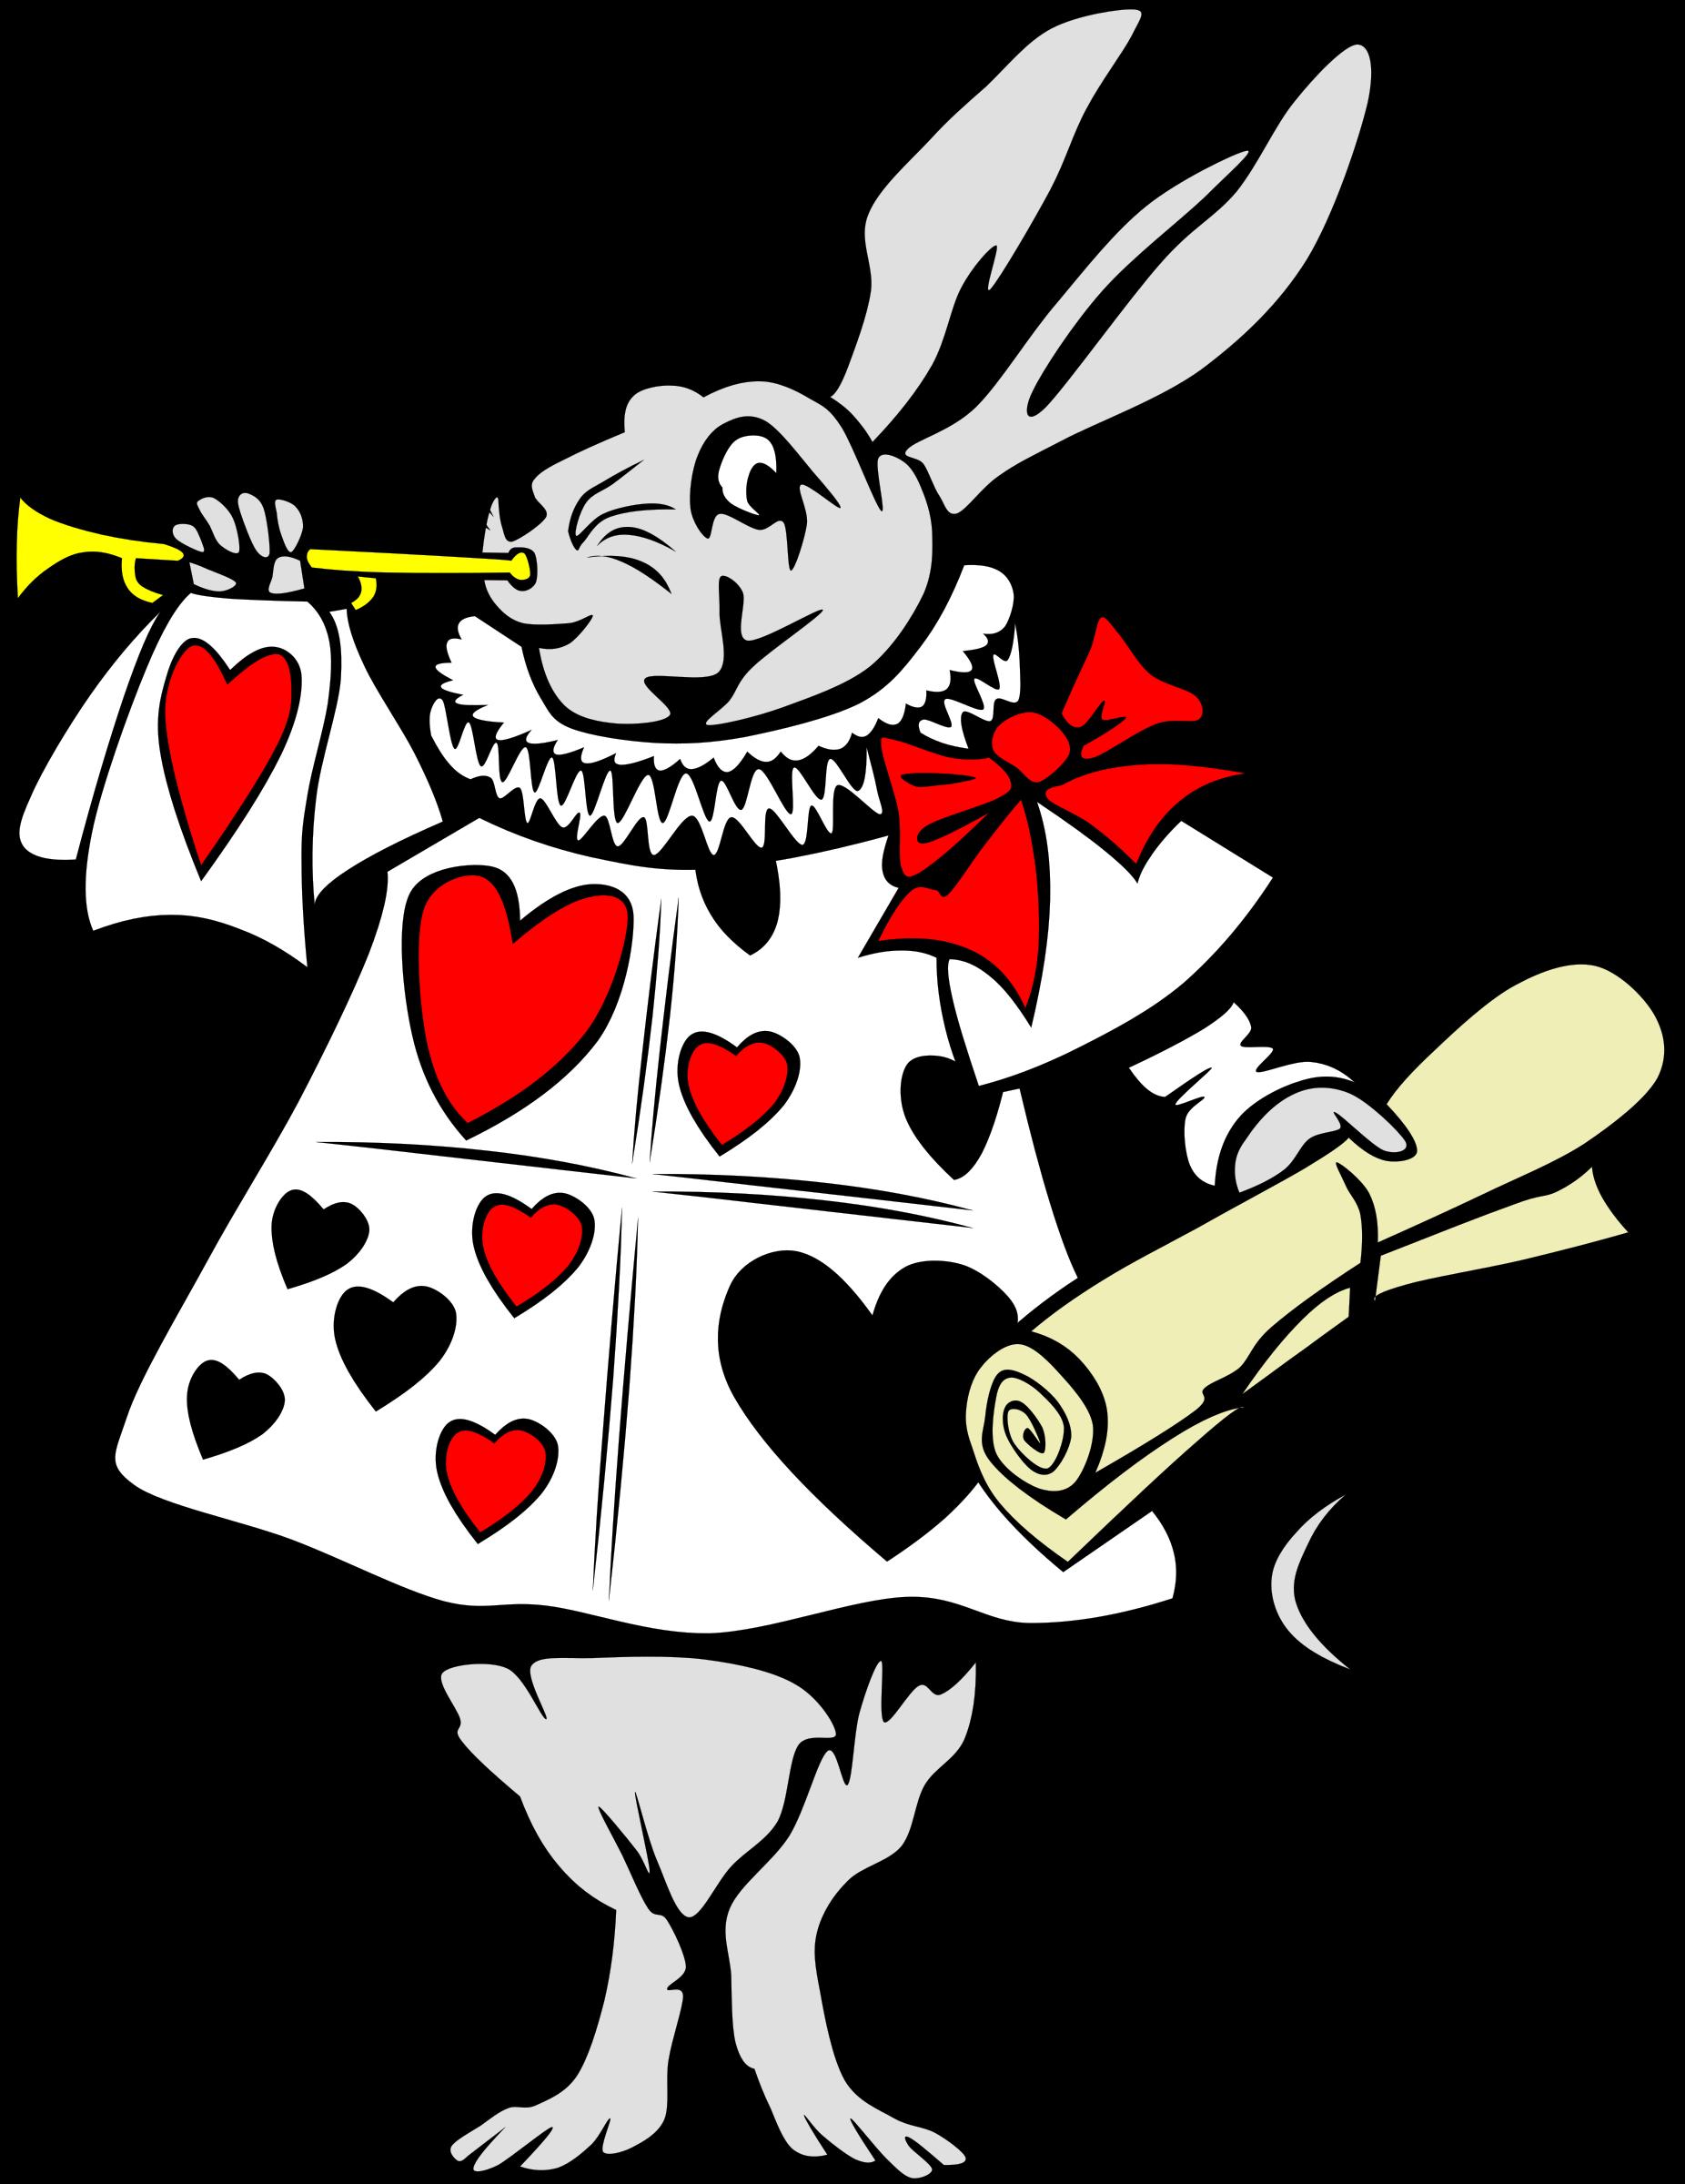 Clipart rabbit swimming. From alice in wonderland